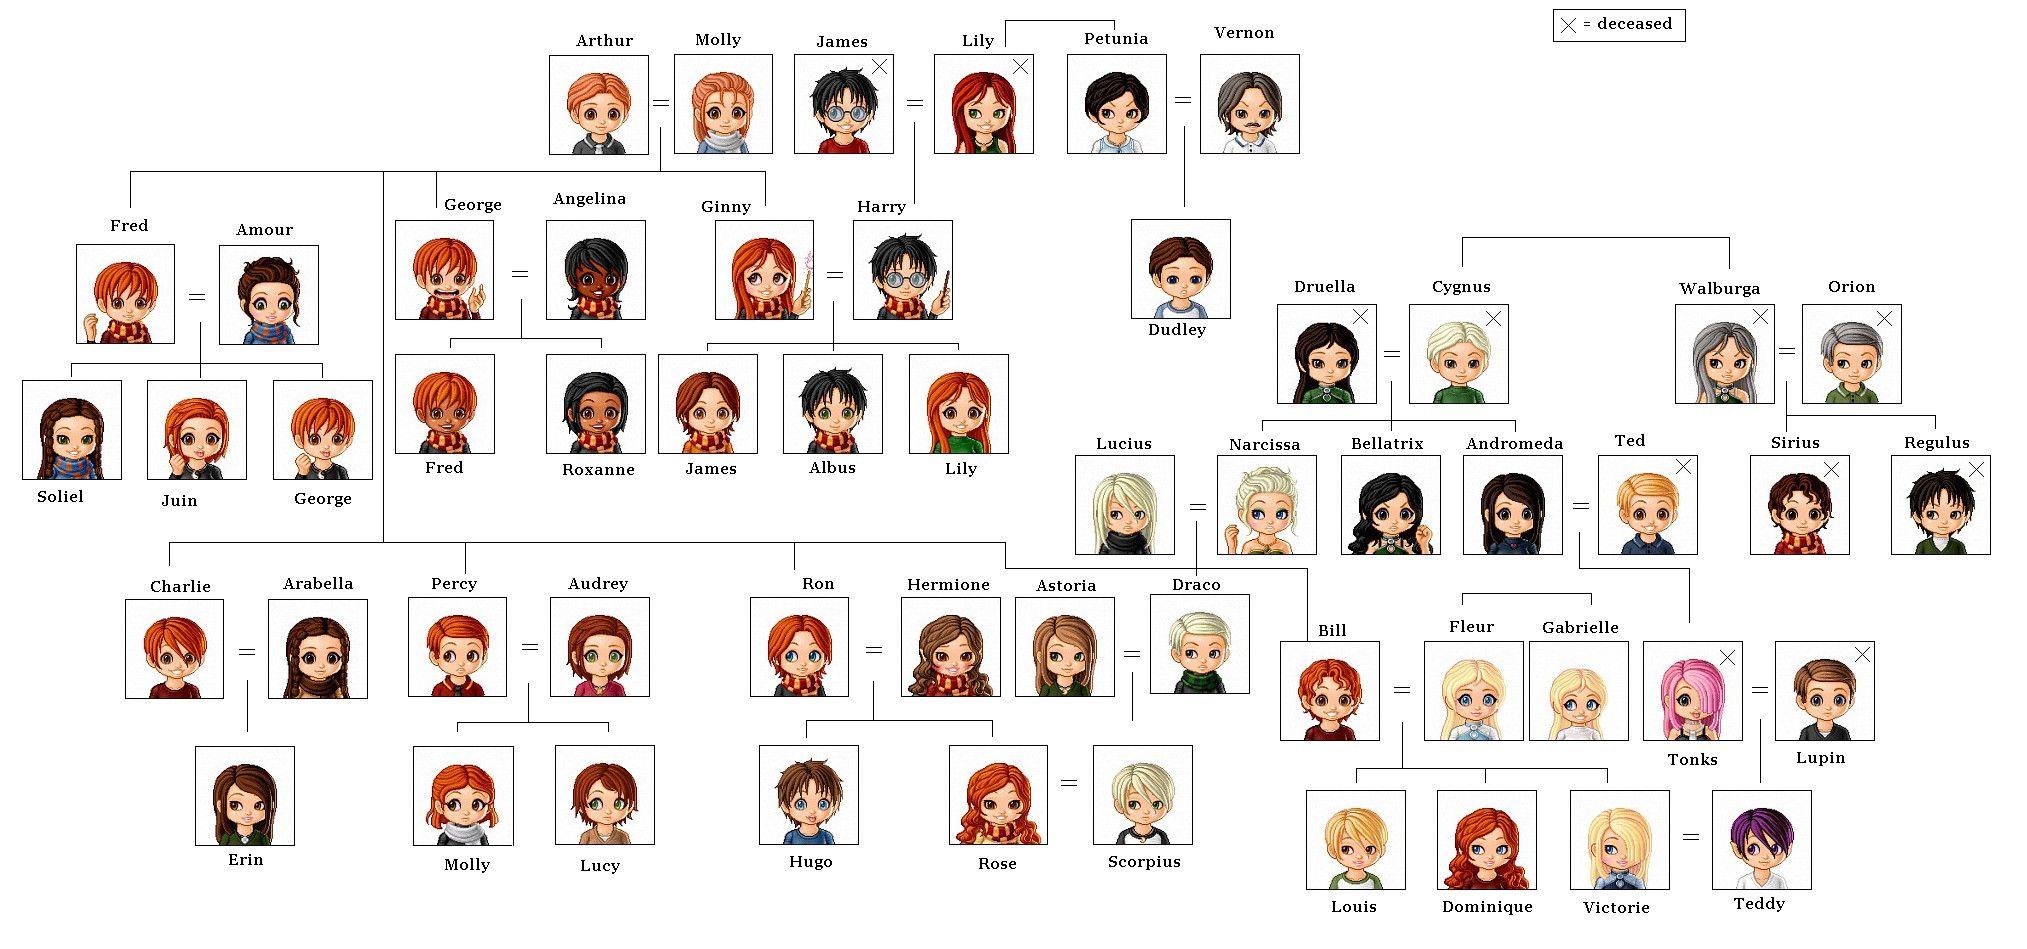 Harry Potter Family Tree Arbol Genealogico Humor Dibujos